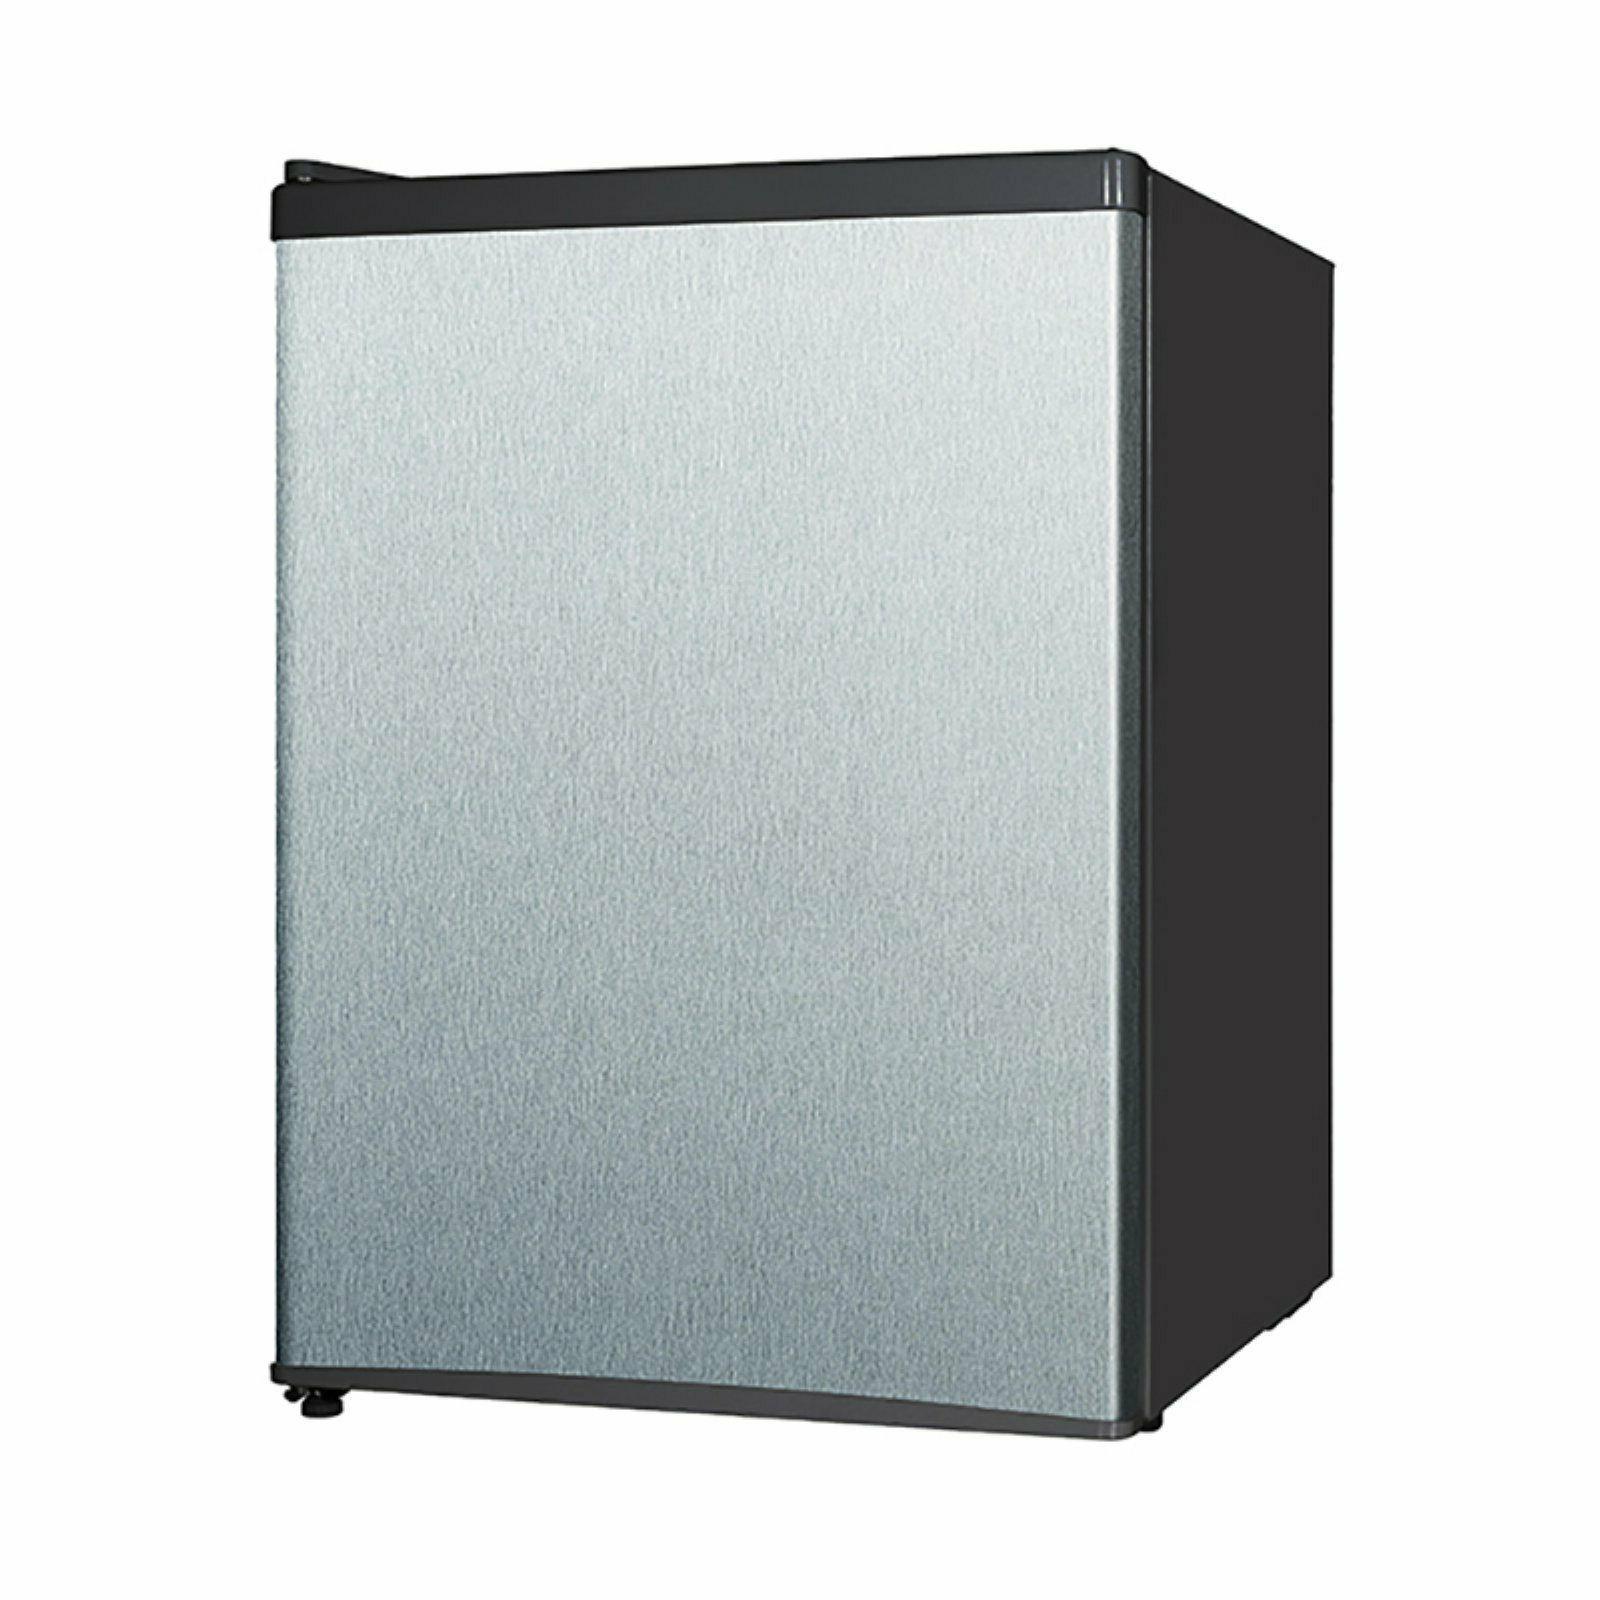 whs 87lss1 refrigerator 2 4 cubic feet